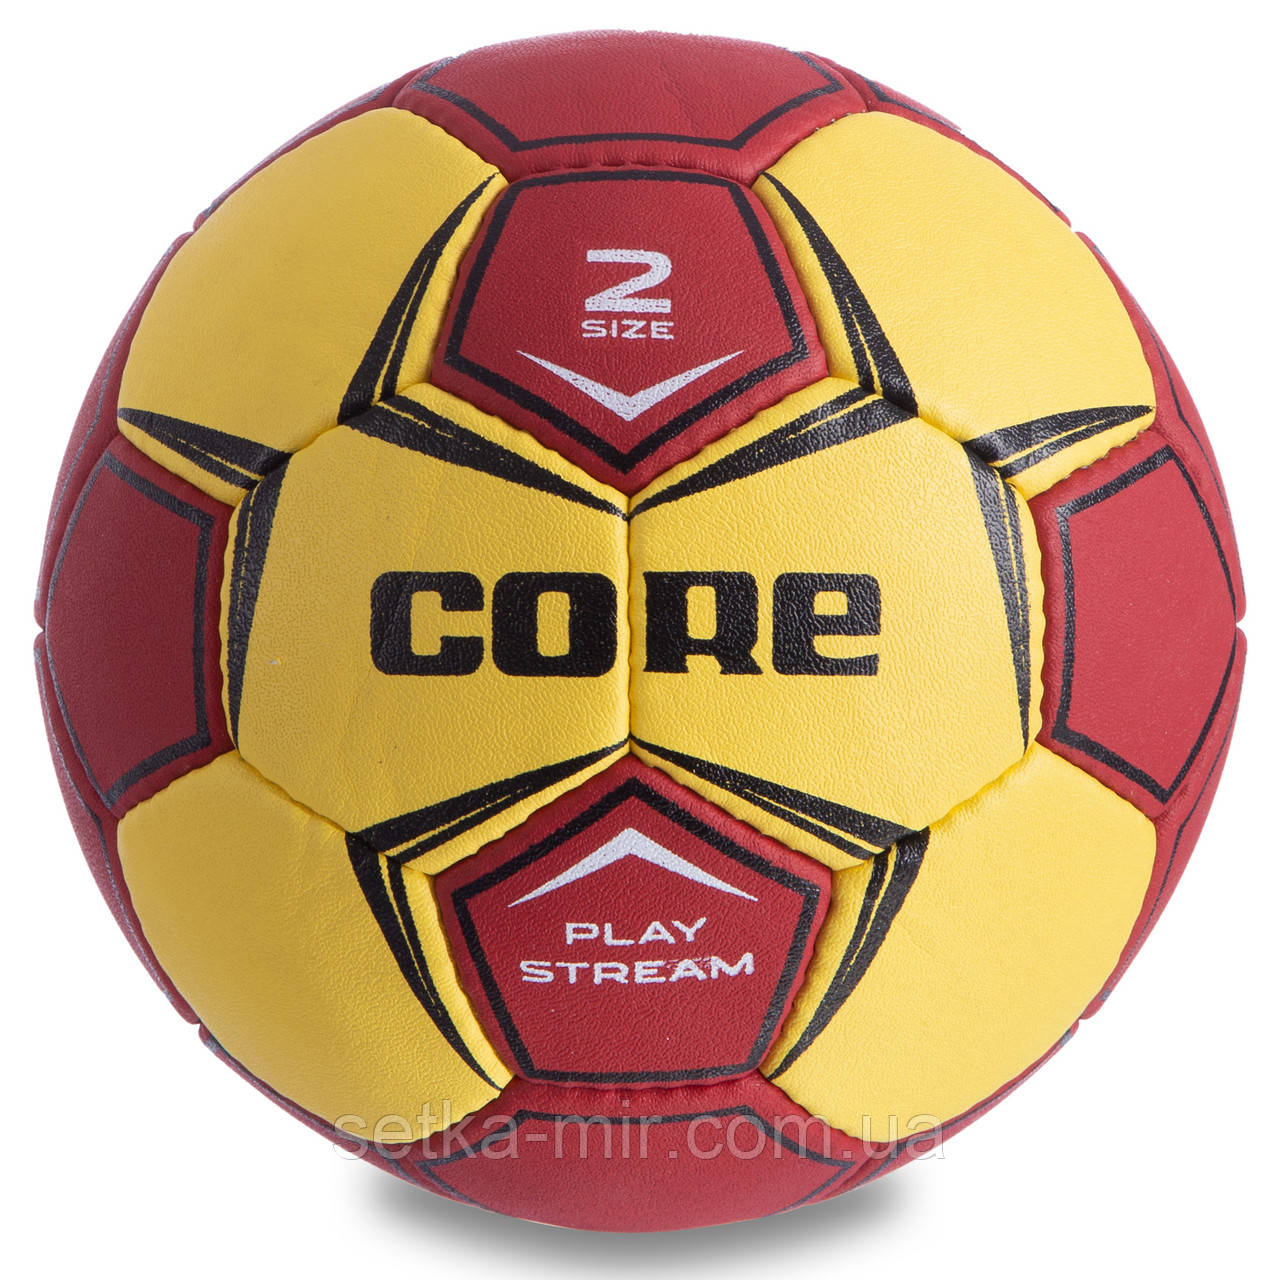 Мяч для гандбола CORE PLAY STREAM CRH-049-2 (PU, р-р 2, сшит вручную, желтый-красный)